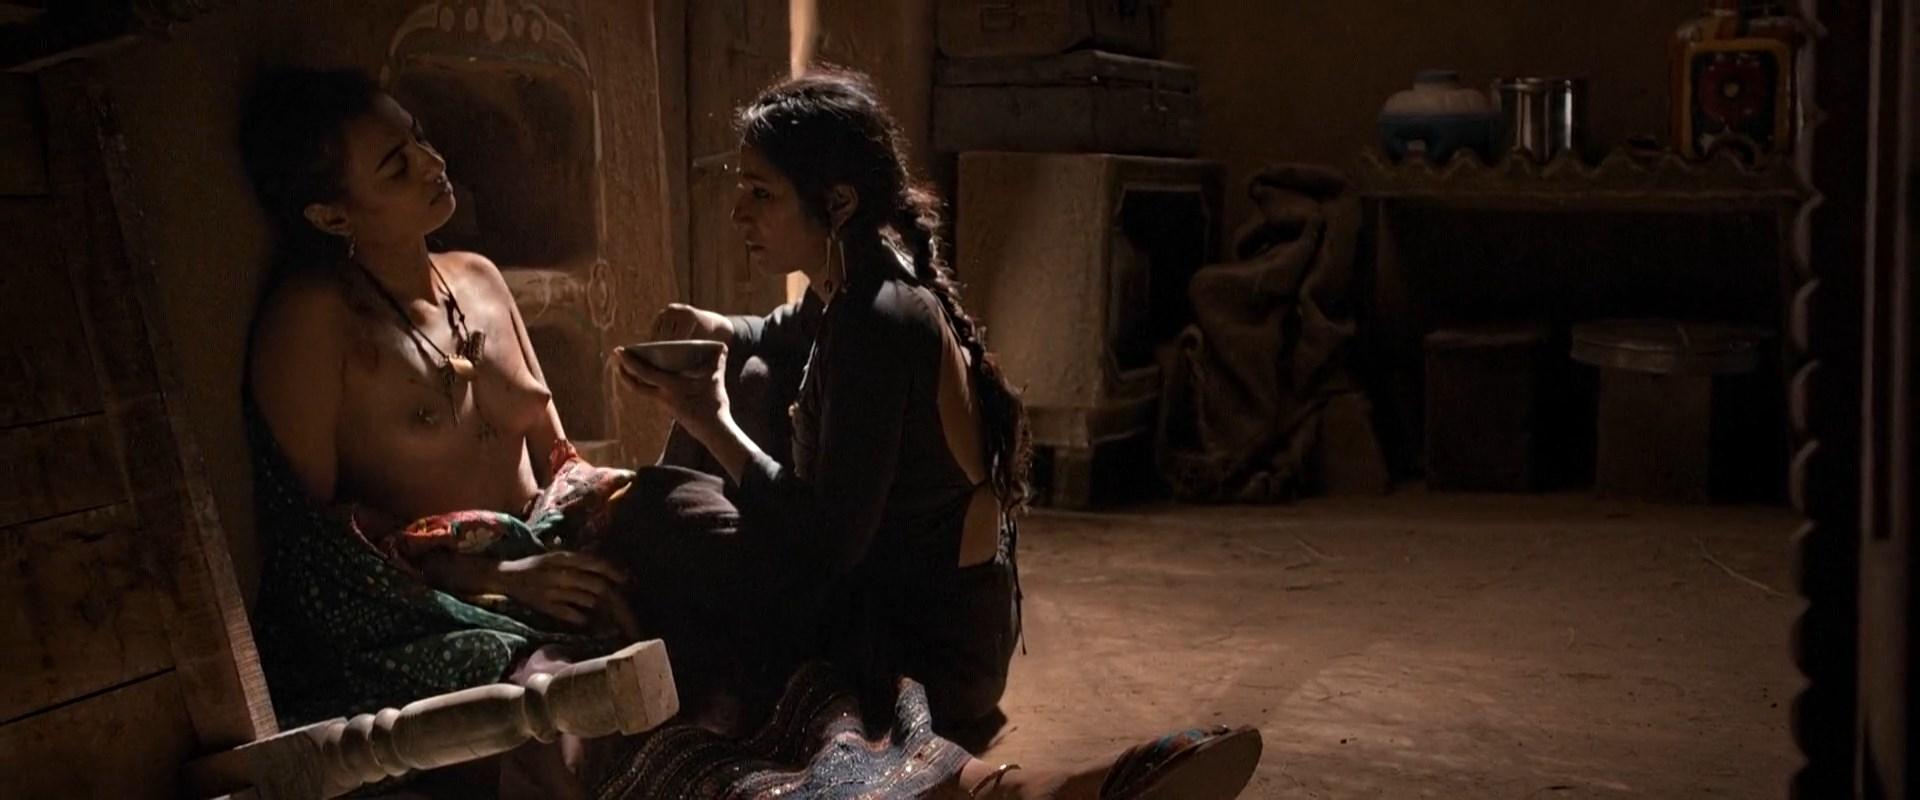 Radhika apte parched sex scene